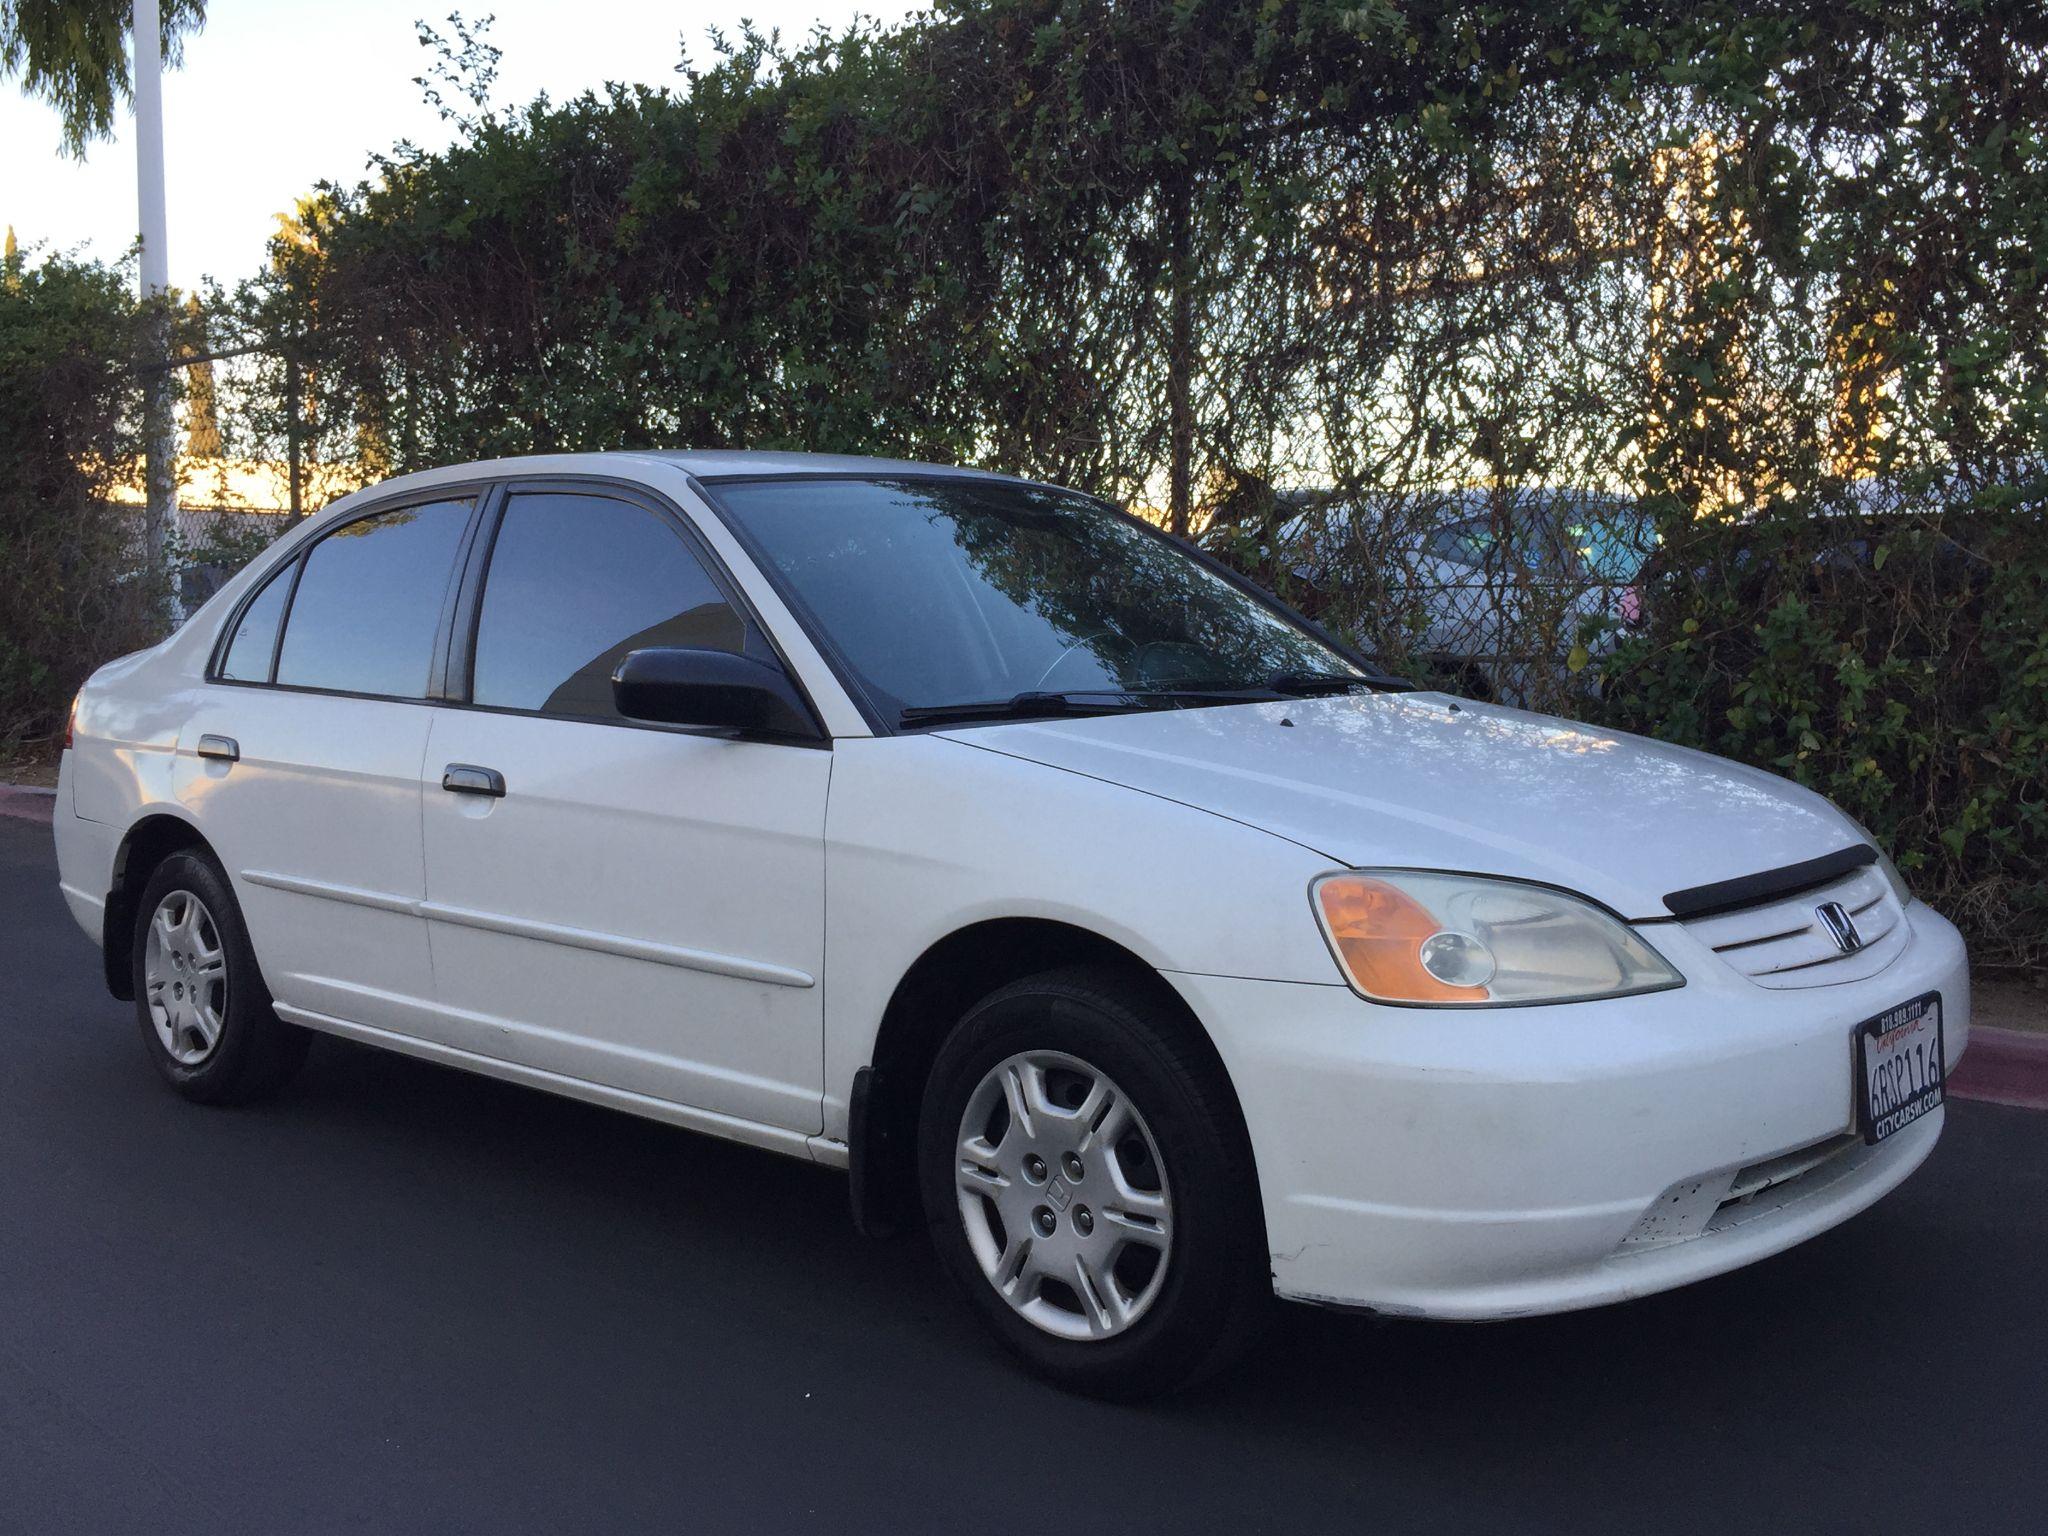 Used 2001 Honda Civic LX at City Cars Warehouse INC